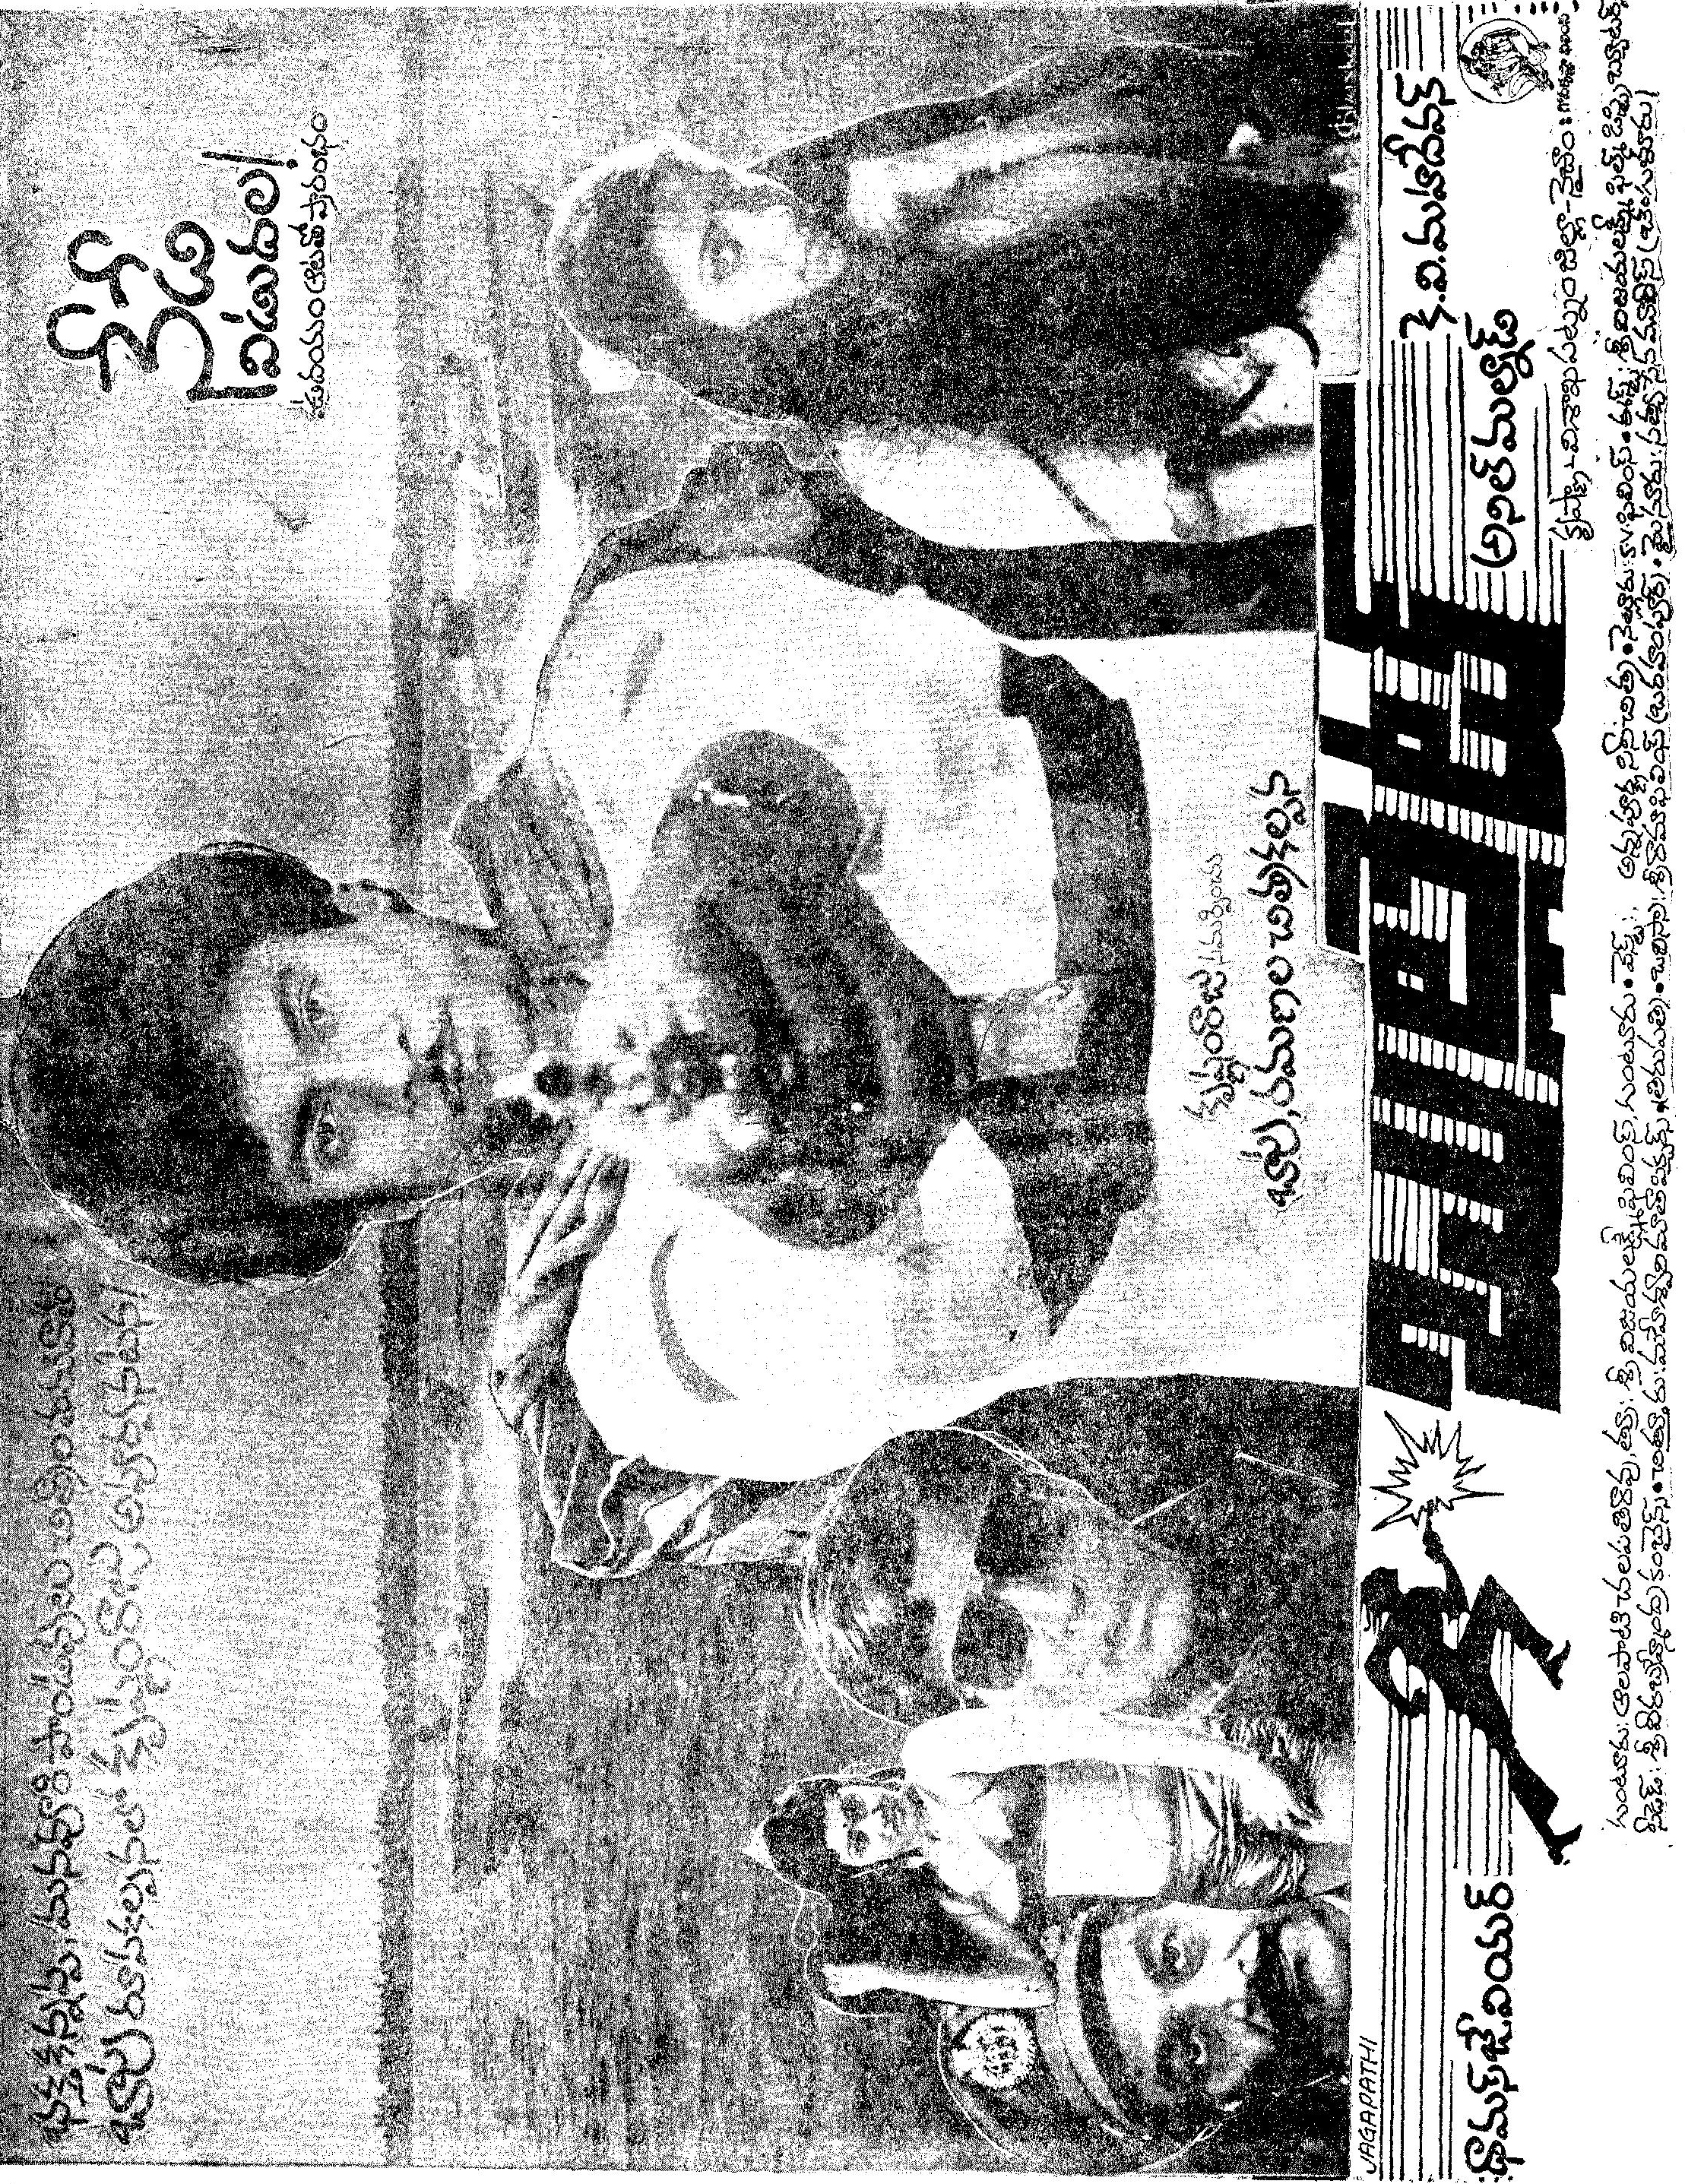 Bullet ((1985))